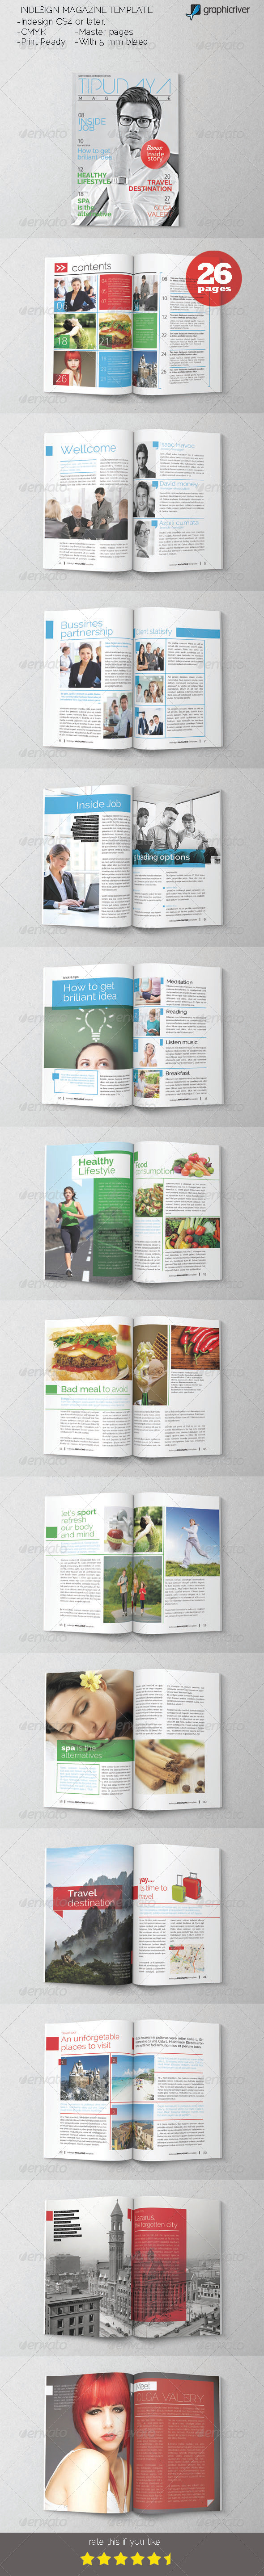 GraphicRiver Indesign Magazine Template 6000460